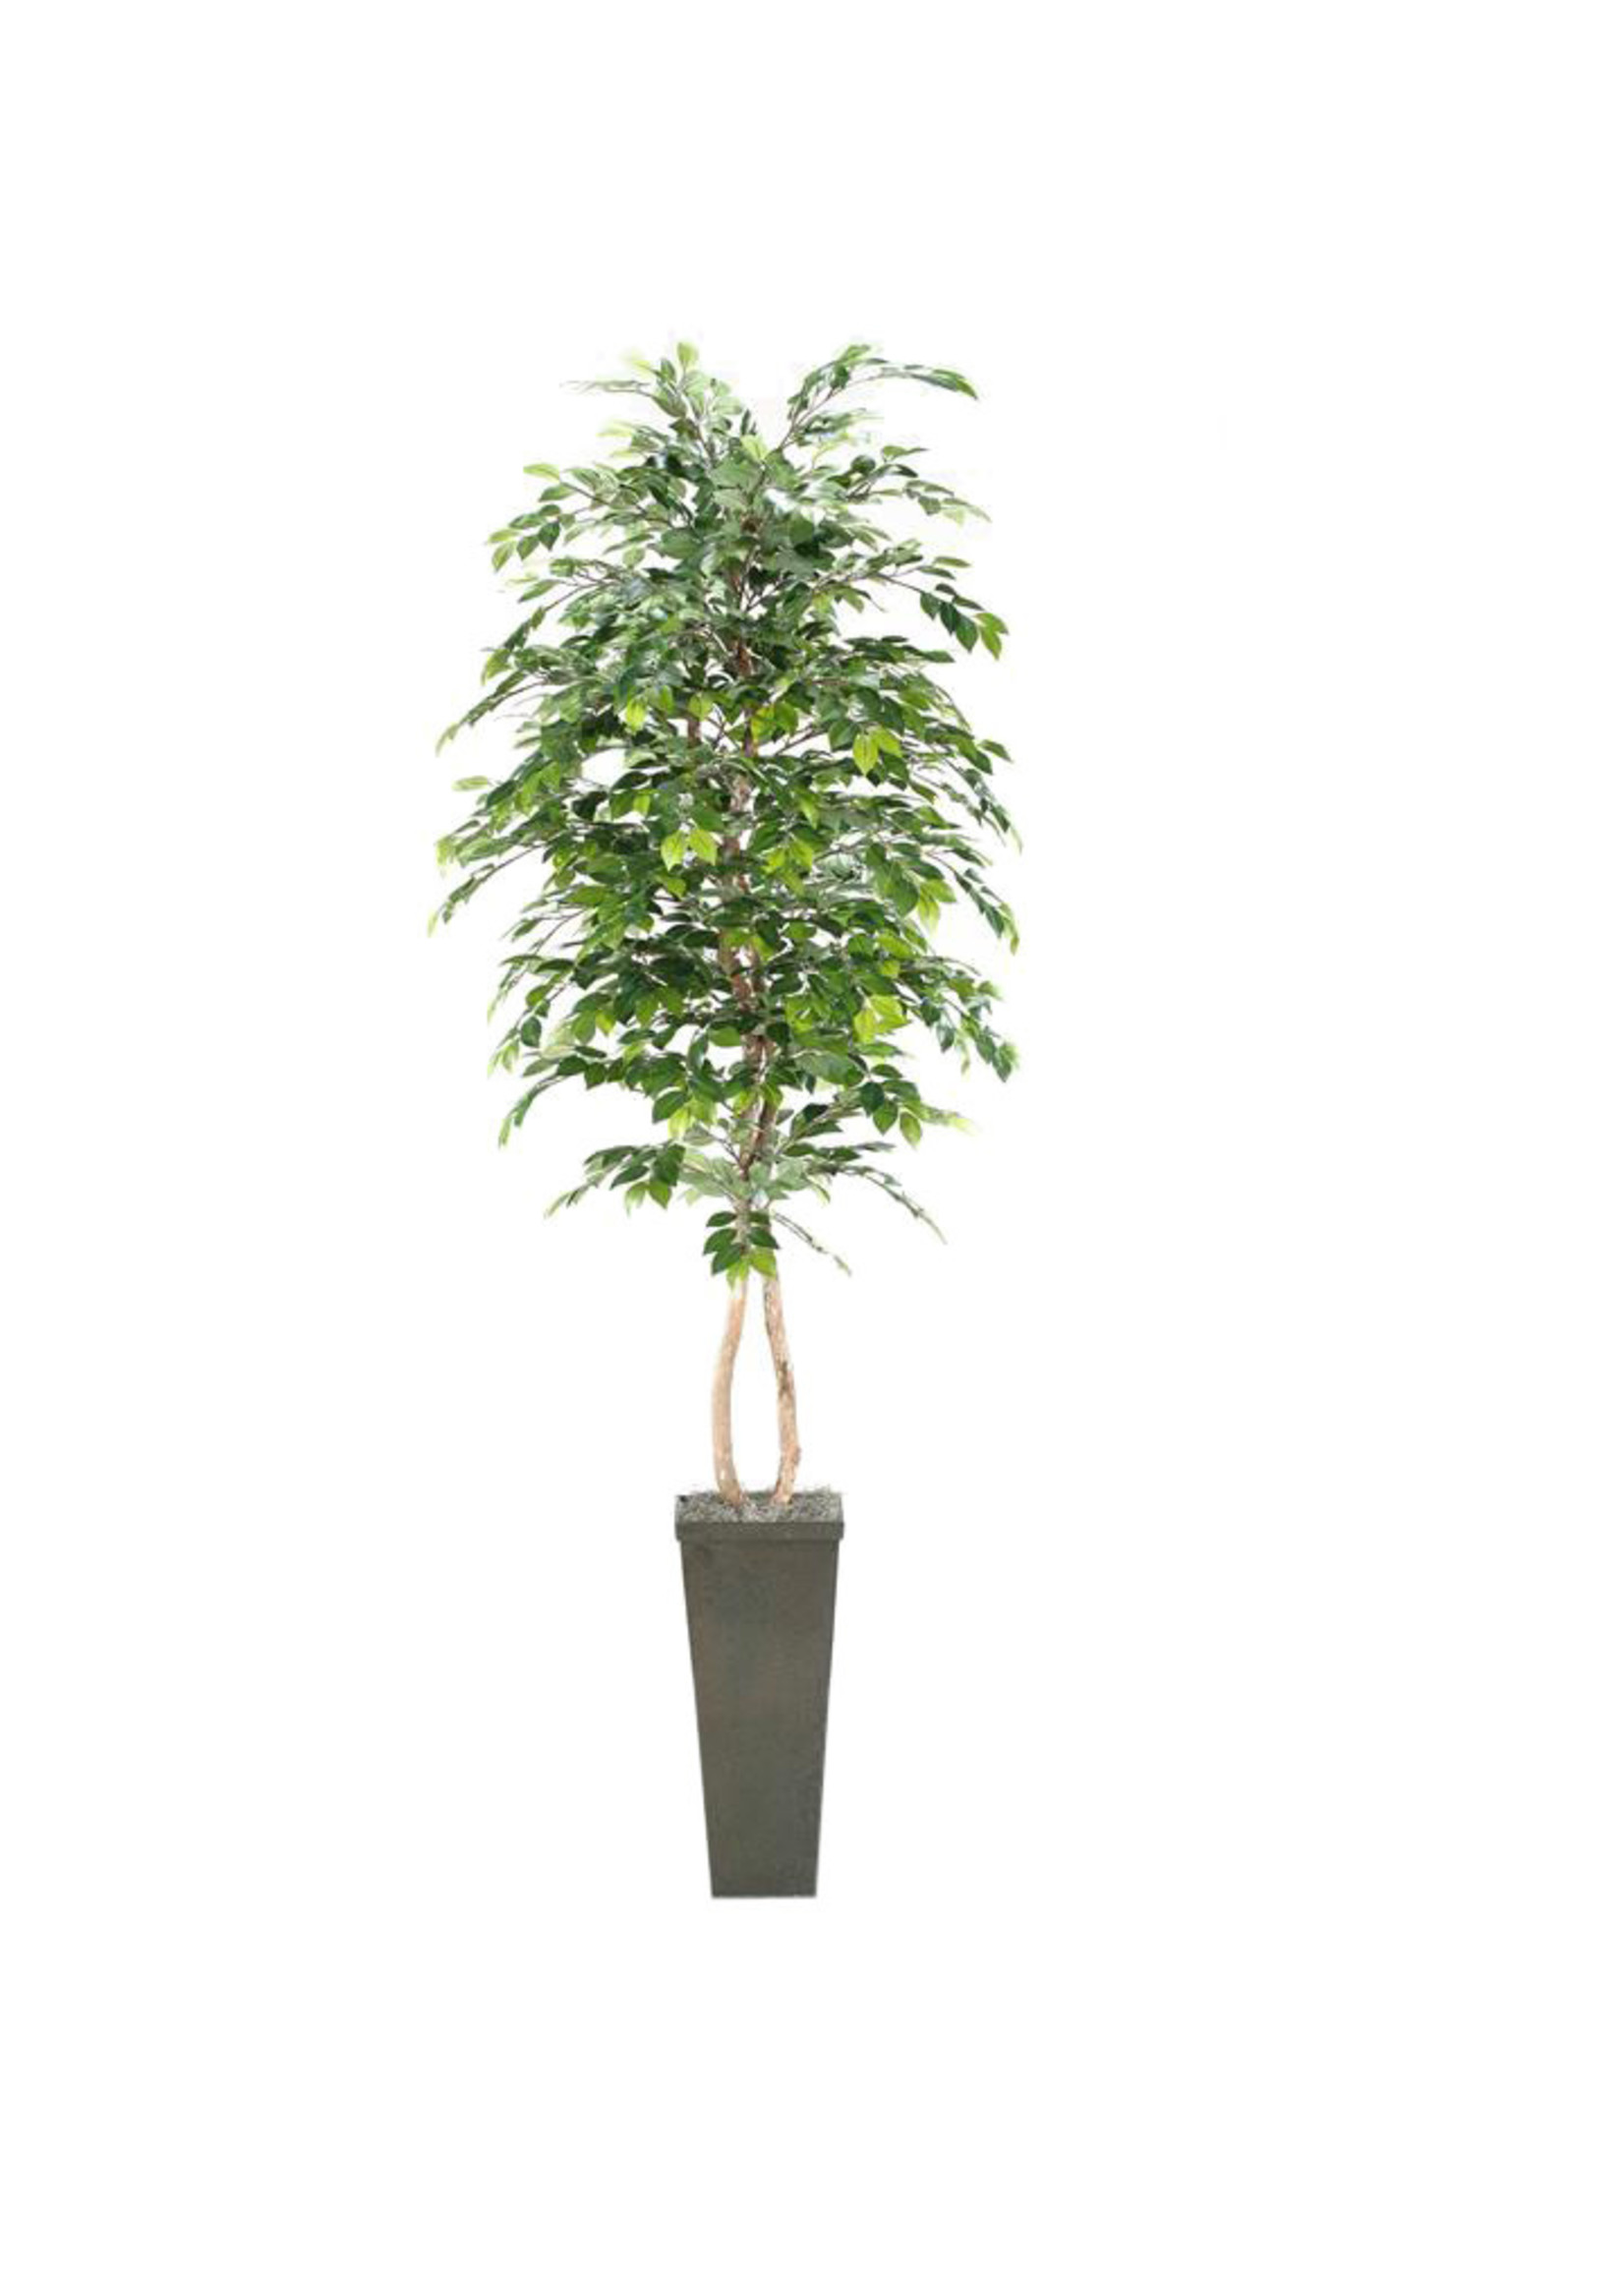 8' SAKAKI TREE IN TALL SQUARE PLANTER